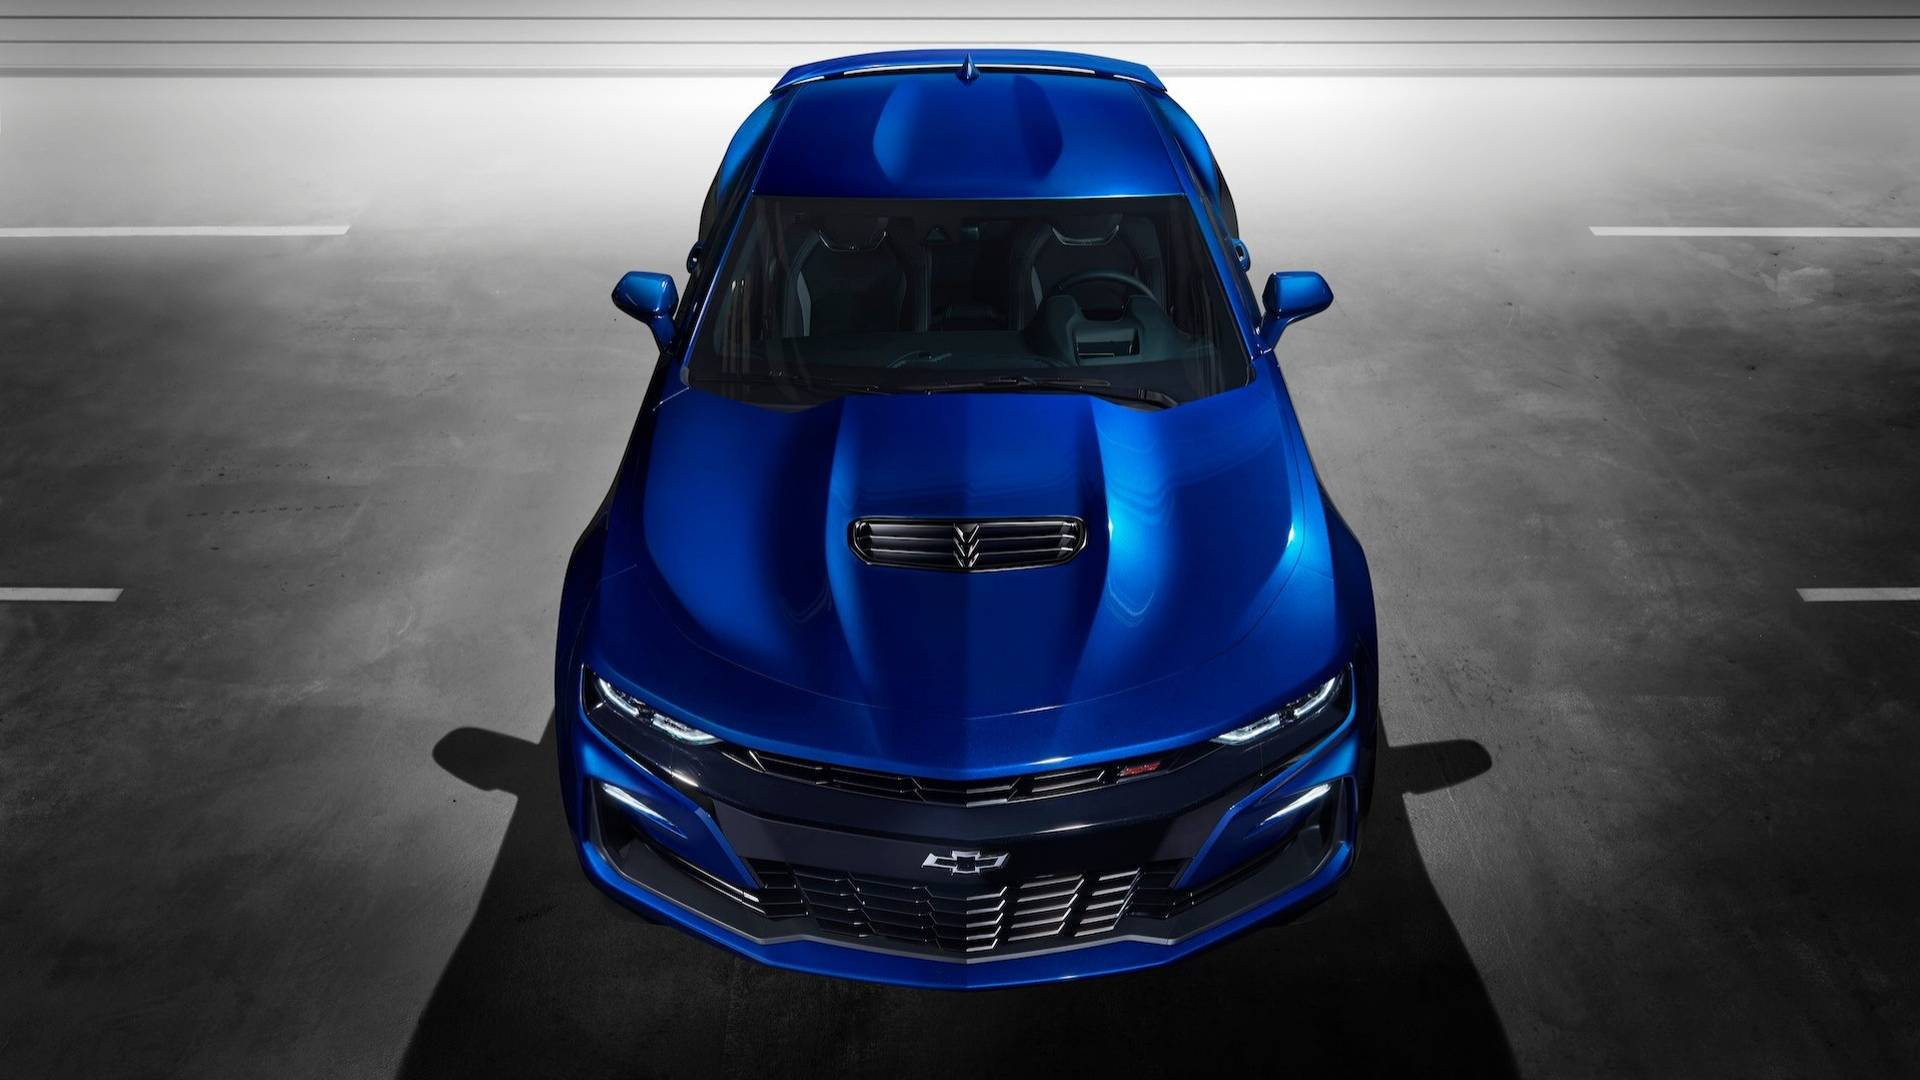 2019_Chevrolet_Camaro_0006